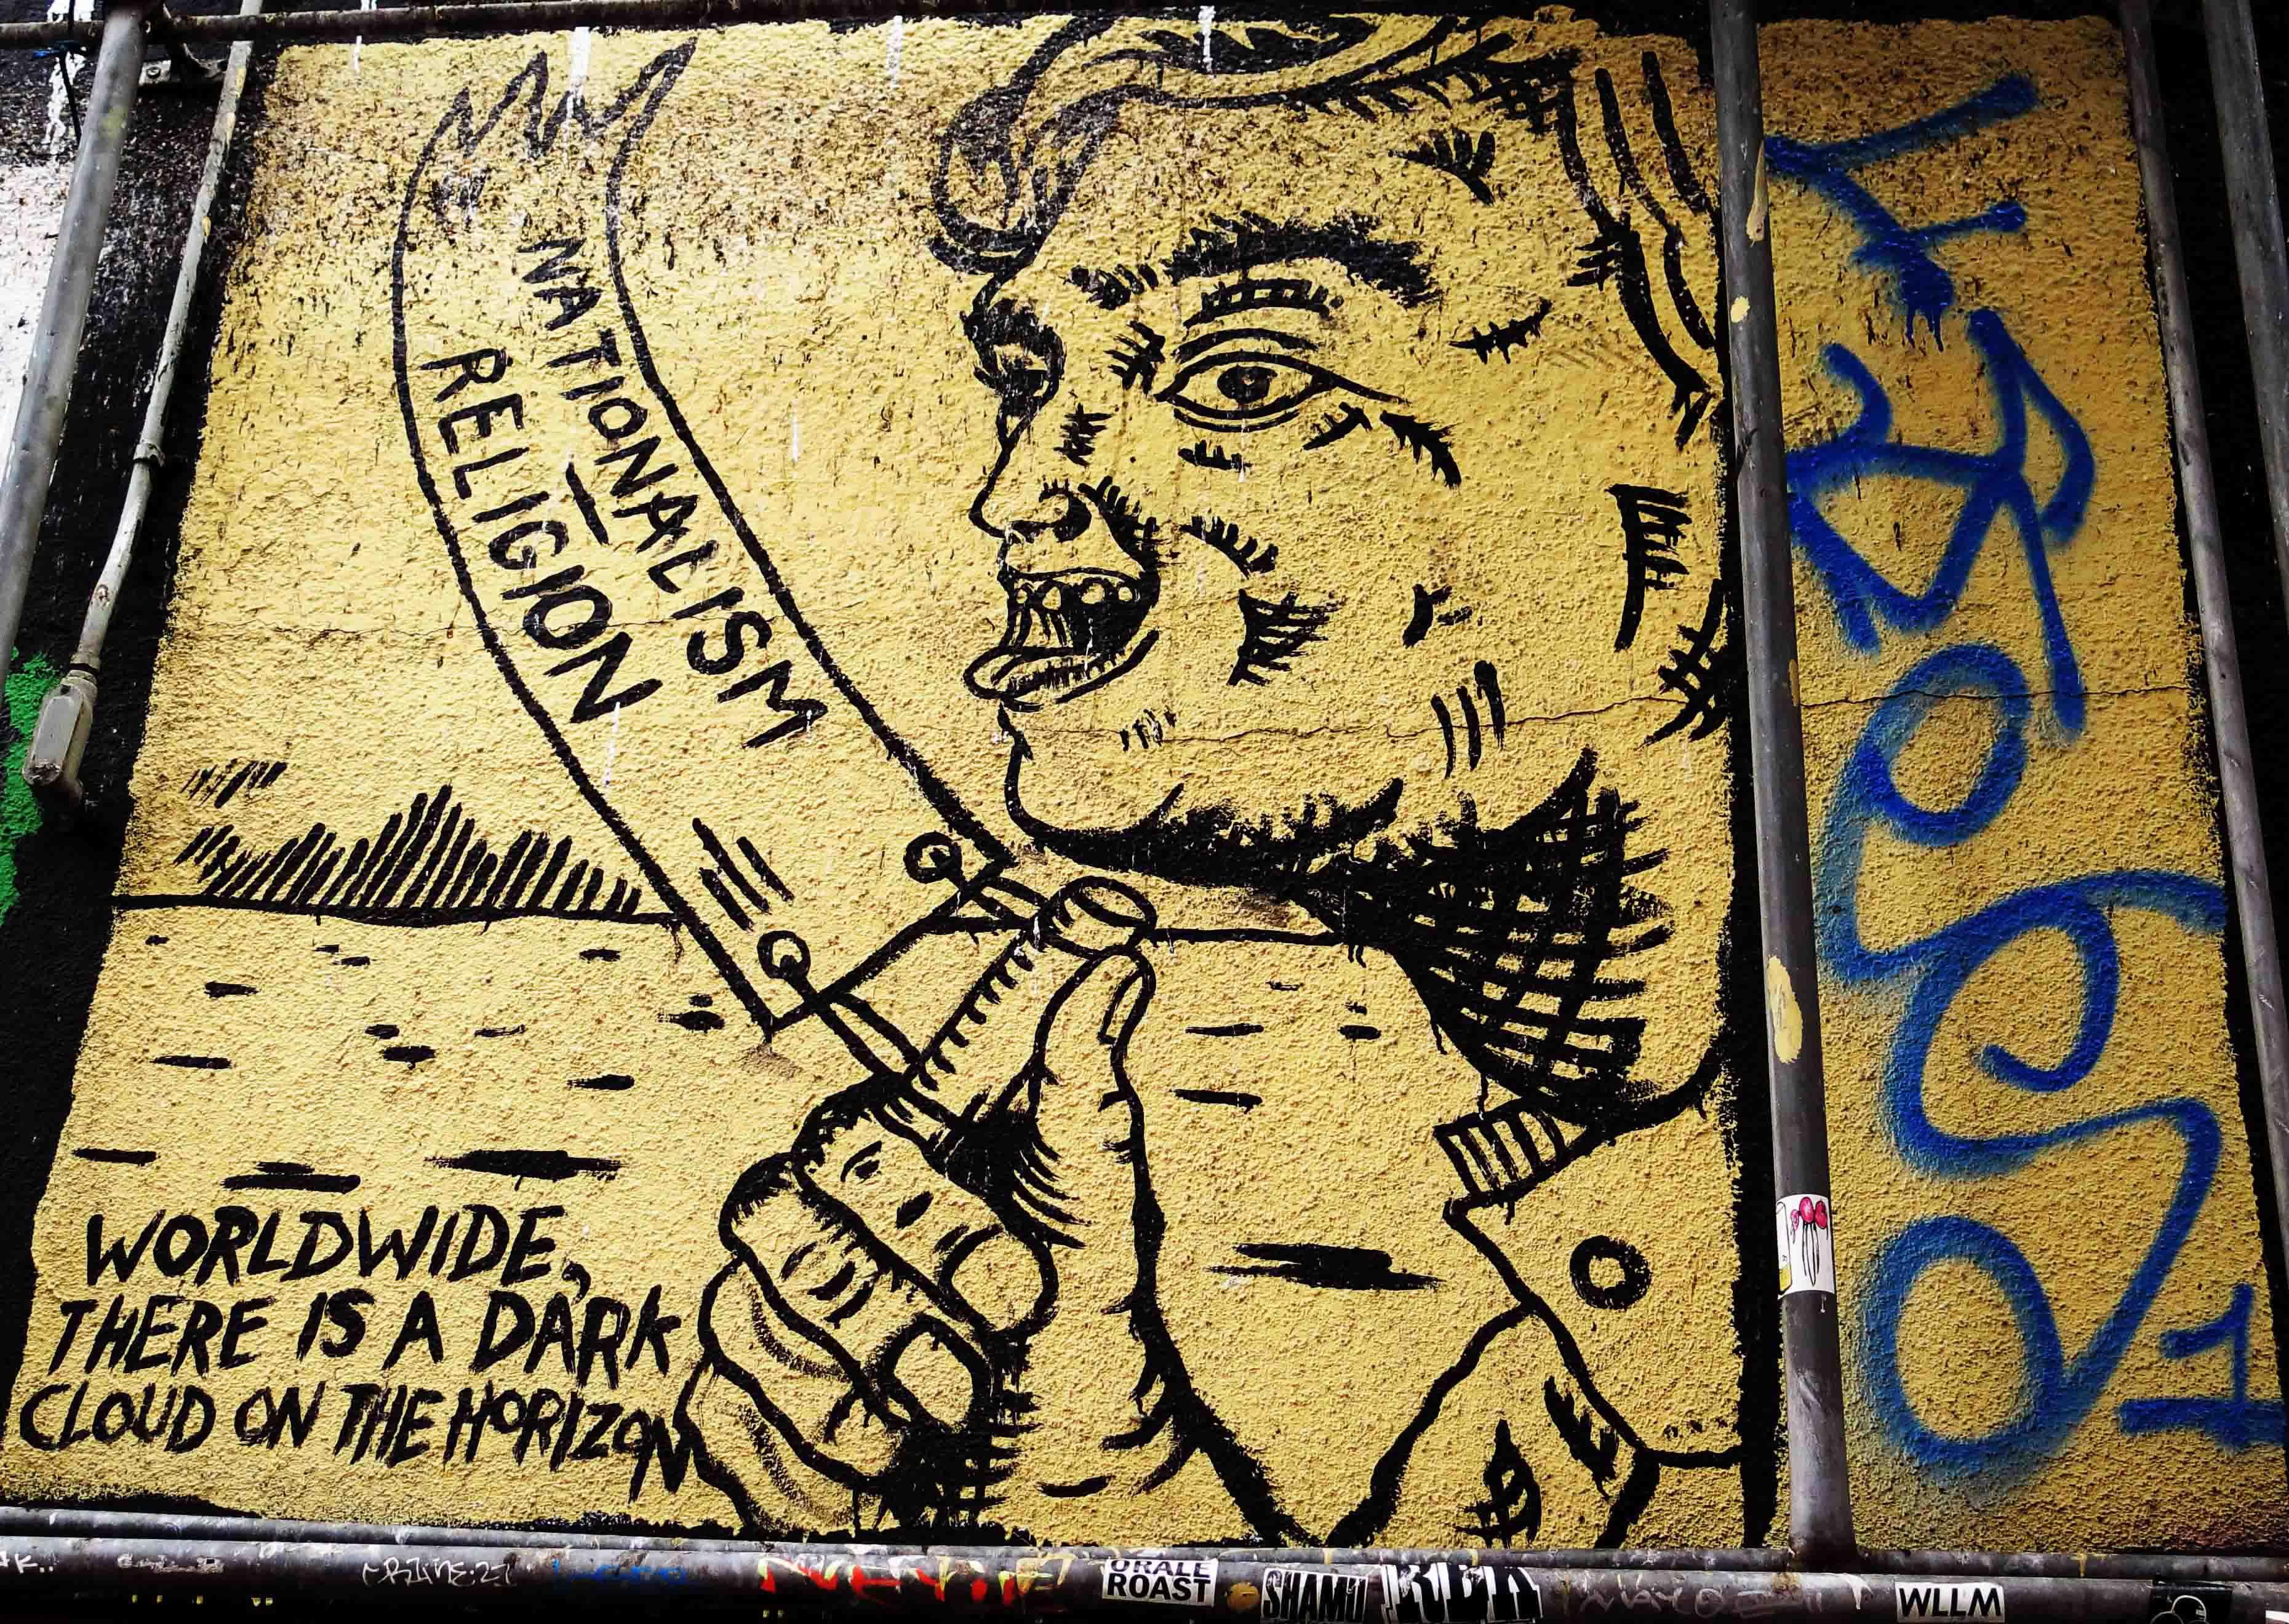 San Francisco\'s graffiti war | CNN Travel